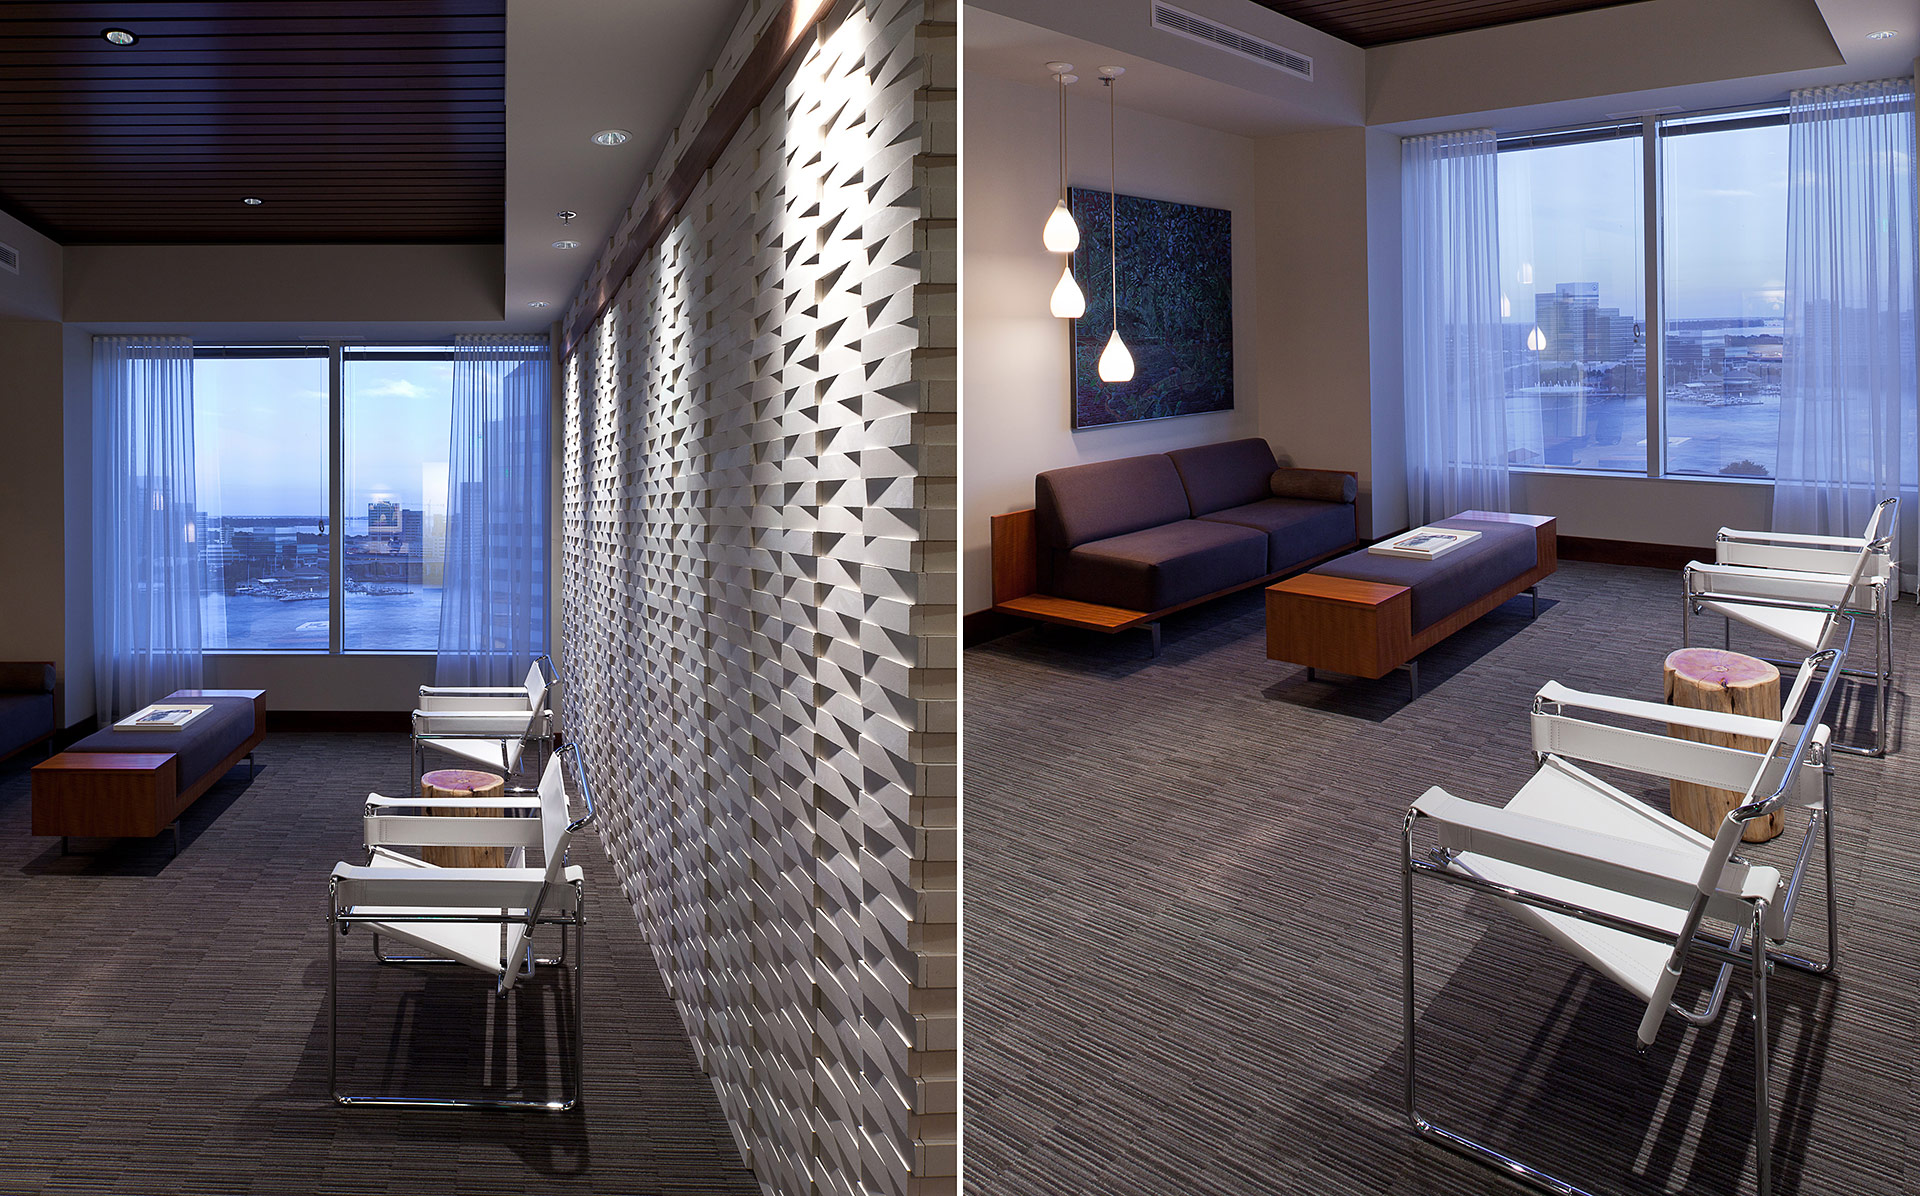 Studio m interior design modern law office Interior designers jacksonville florida